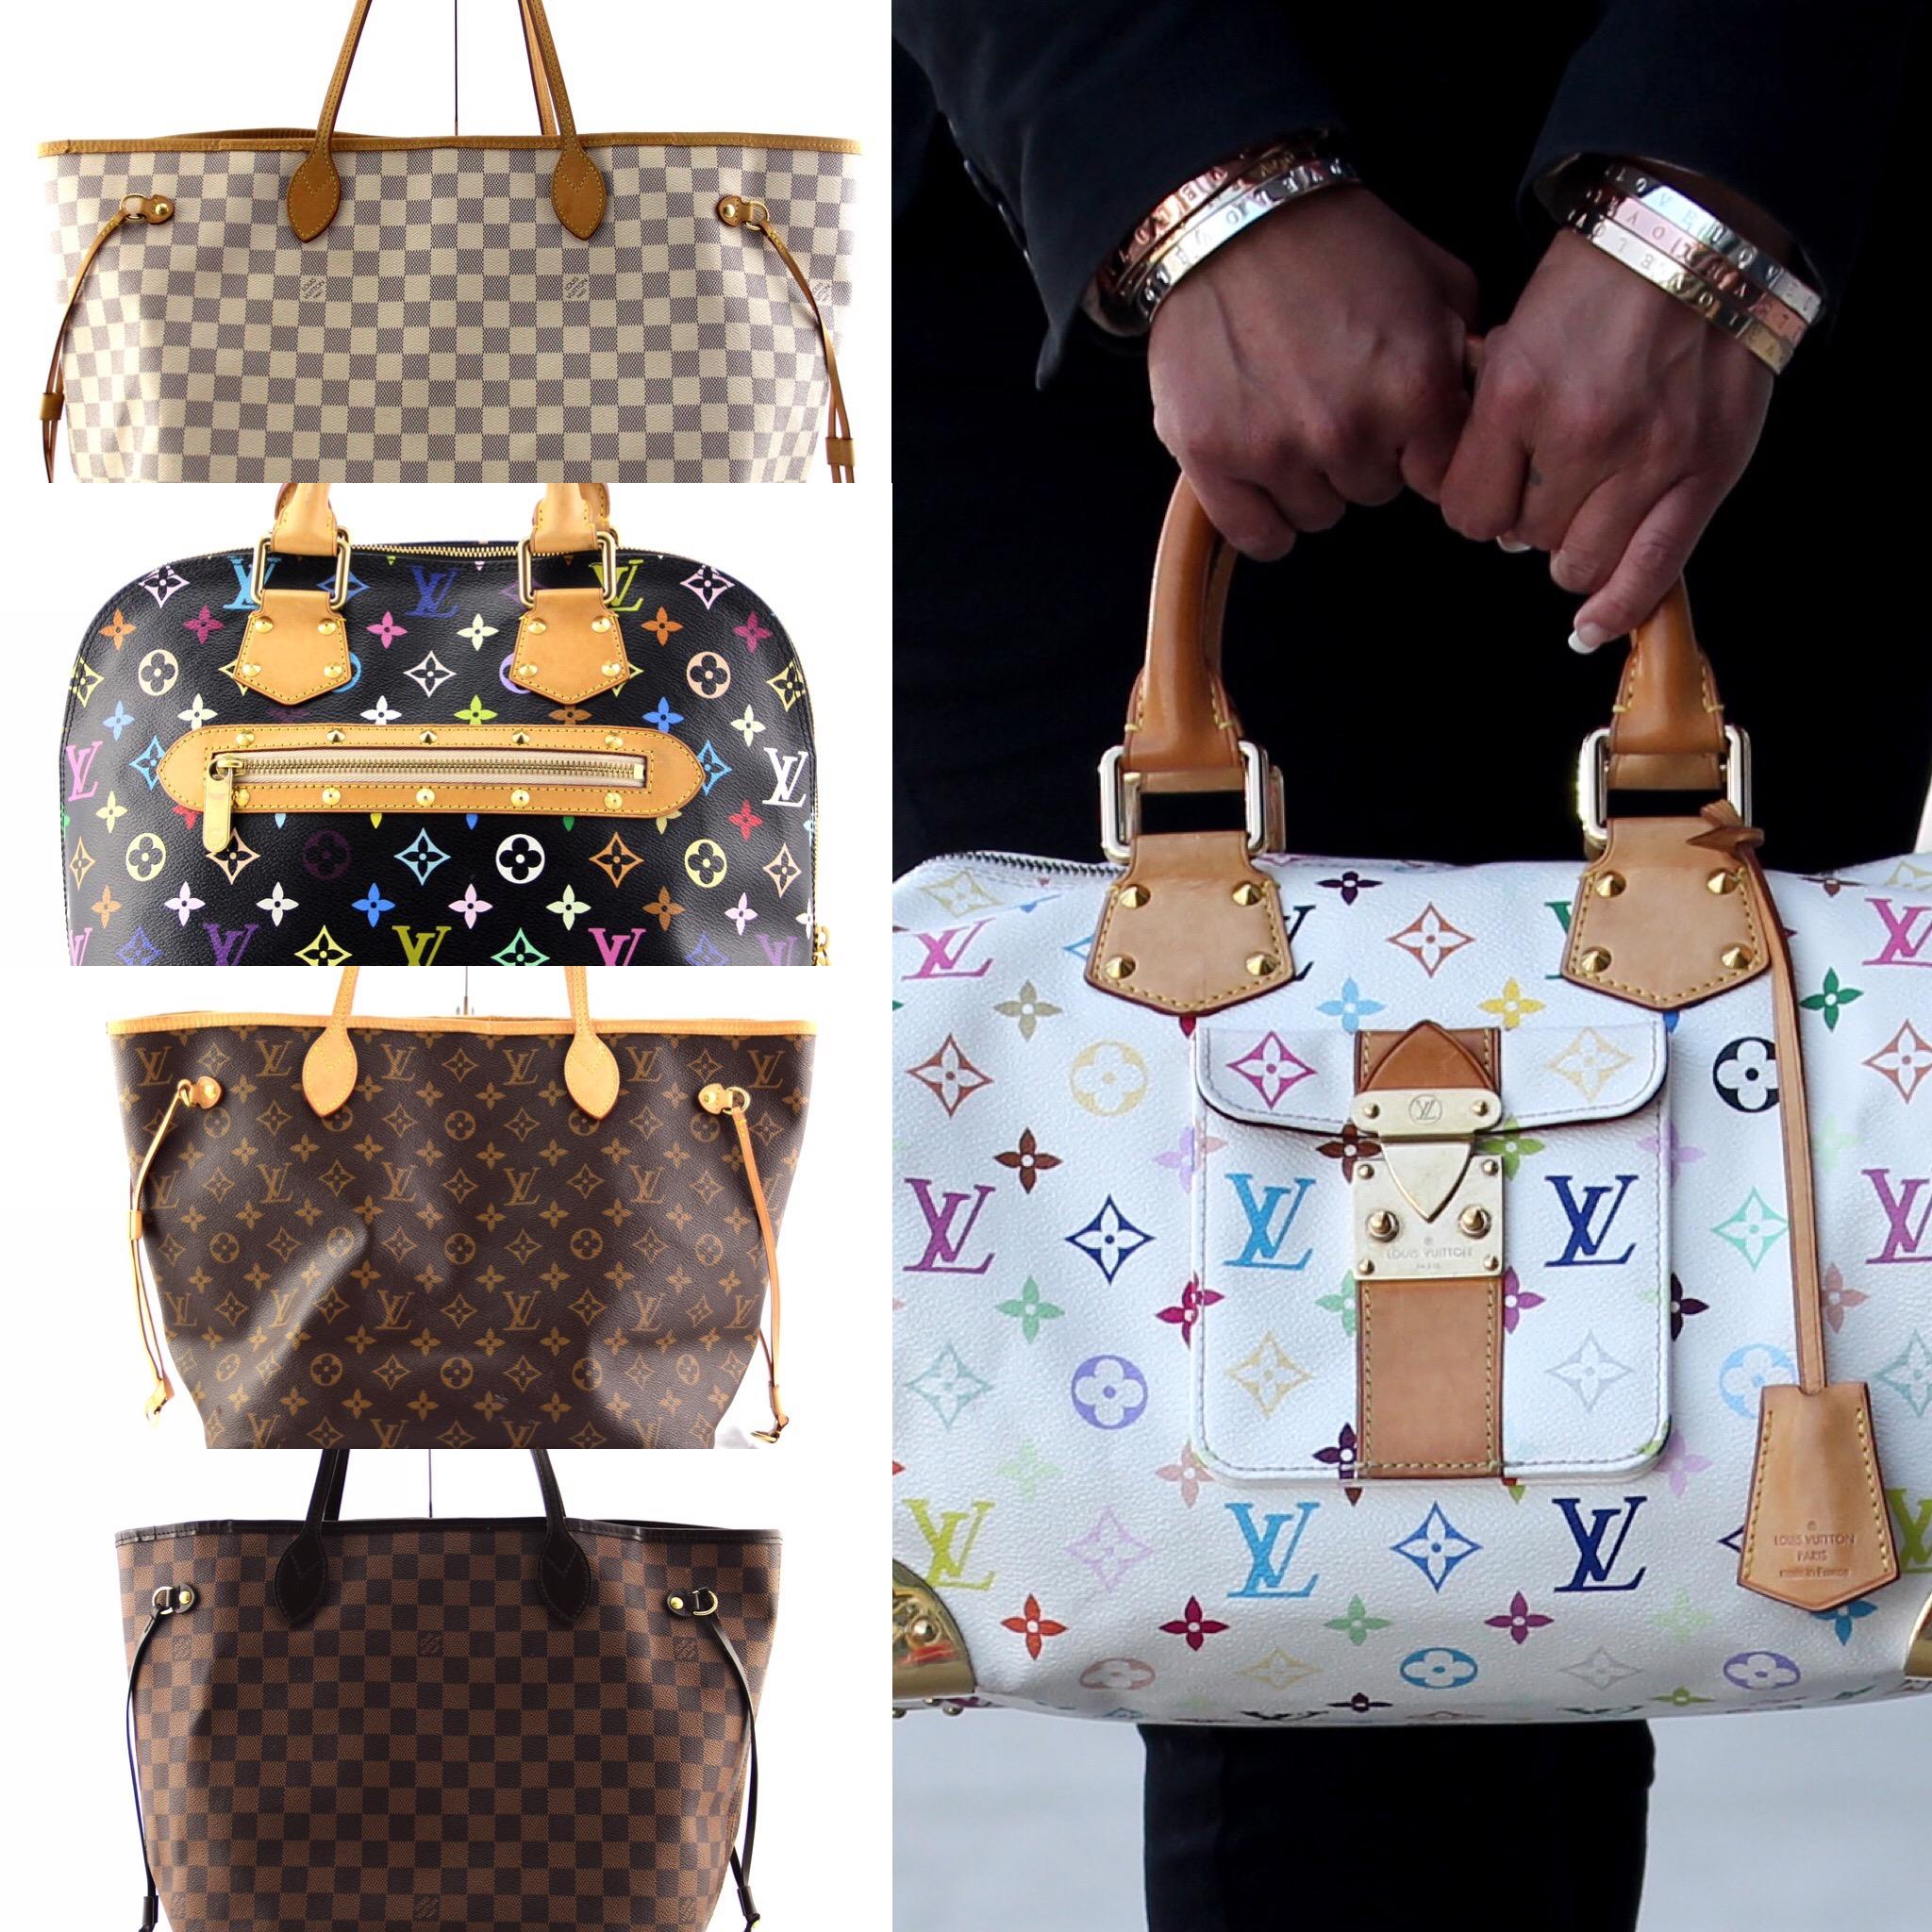 Louis Vuitton Patterns